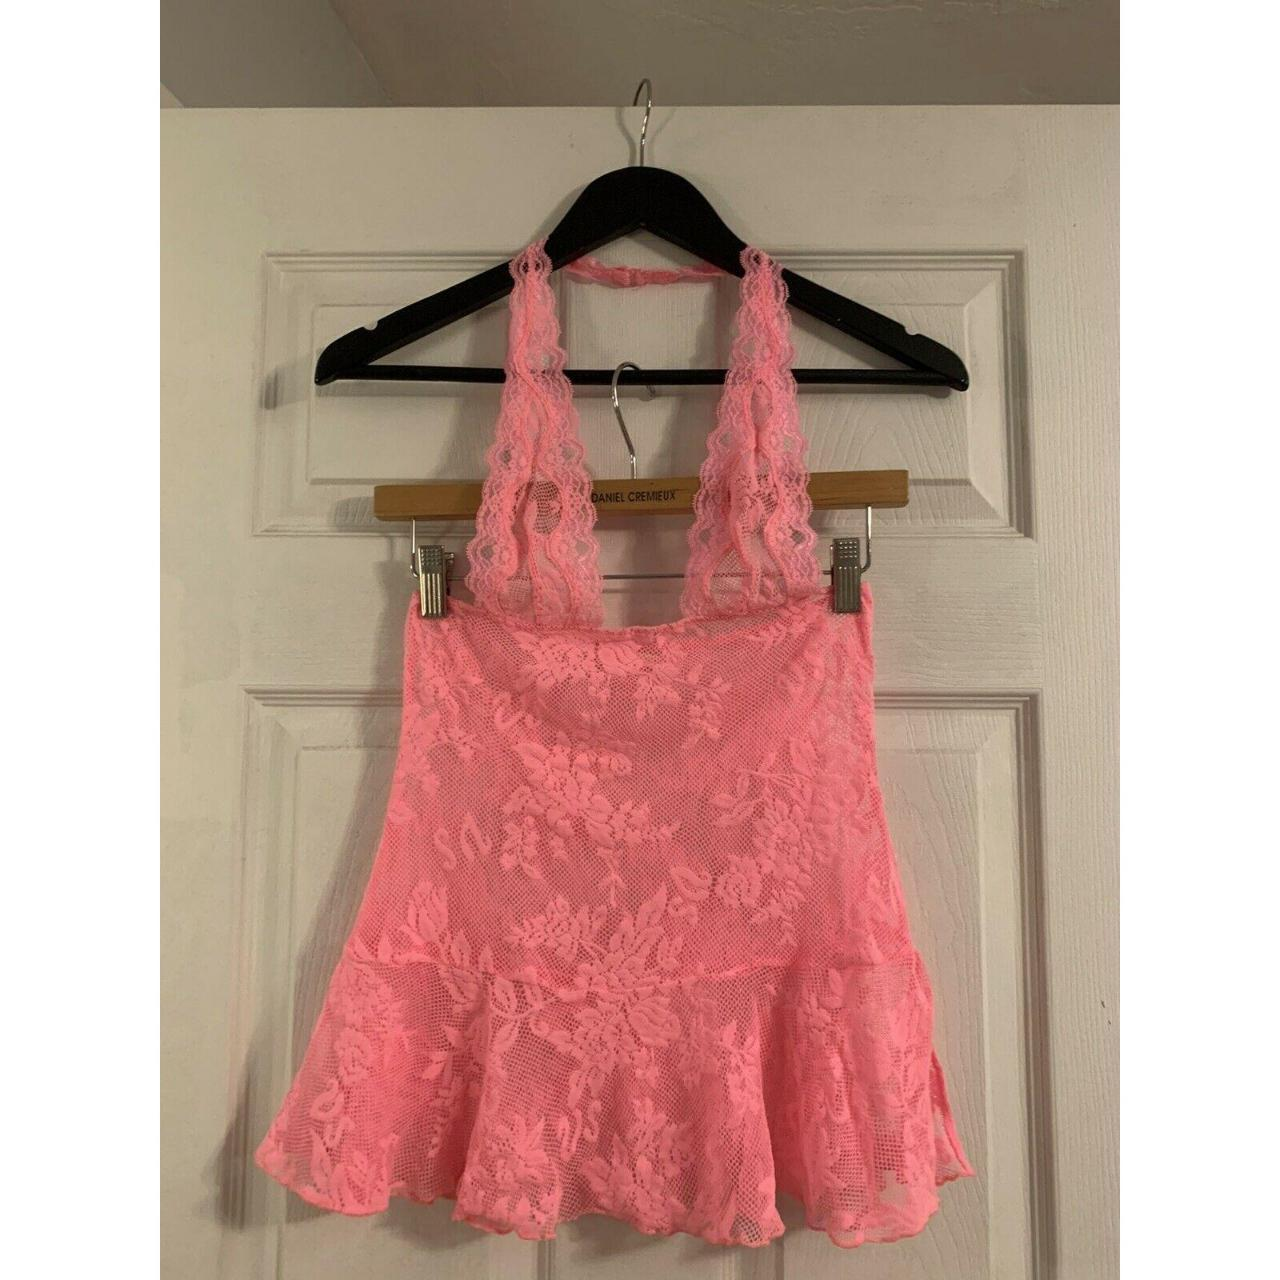 Product Image 1 - Victoria Secret Gown/Lingerie Size Small